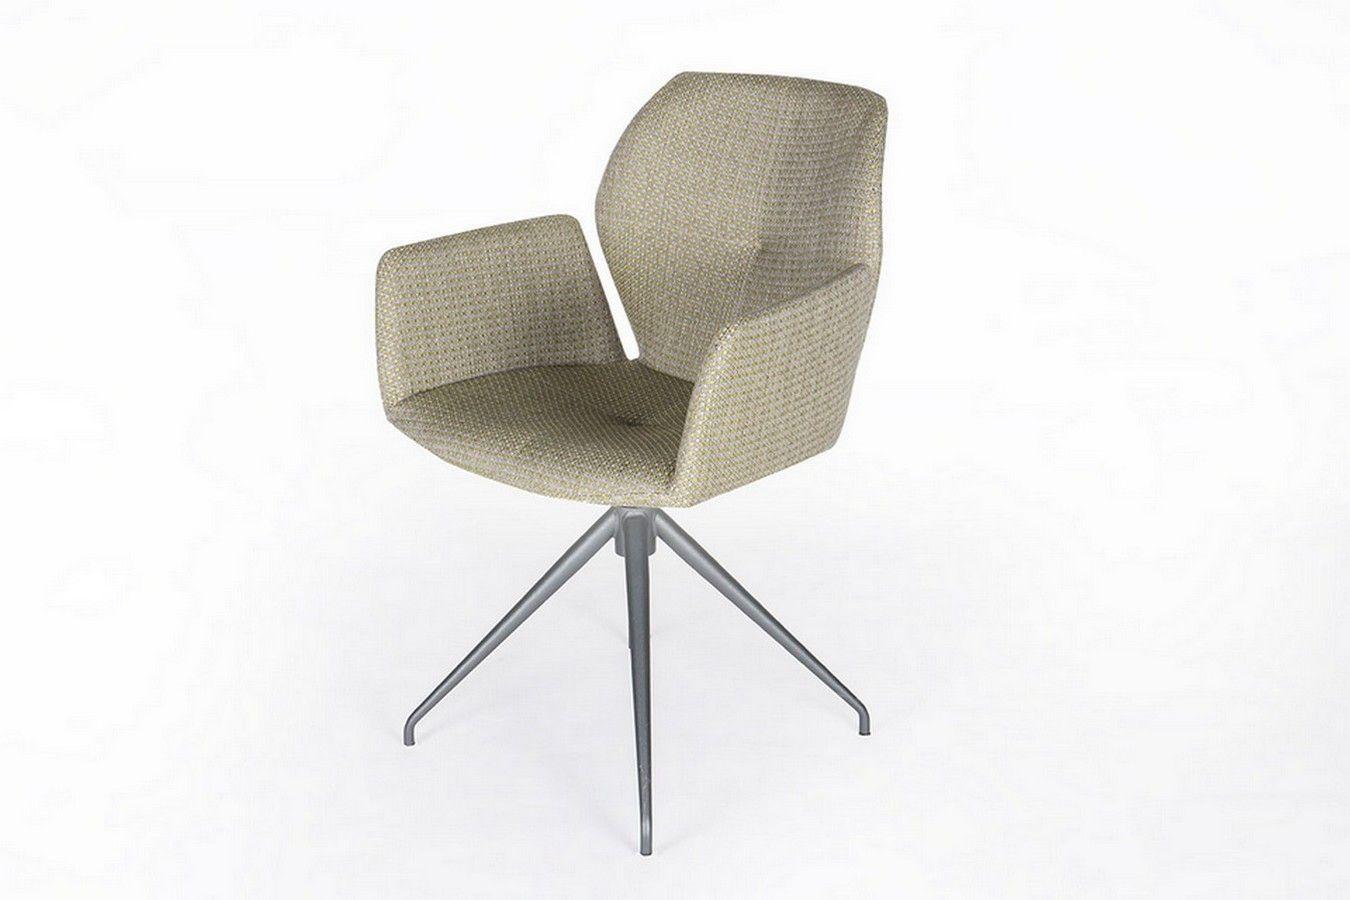 Designersessel Von Mobitec Online Bestellen Sessel Stuhl Design